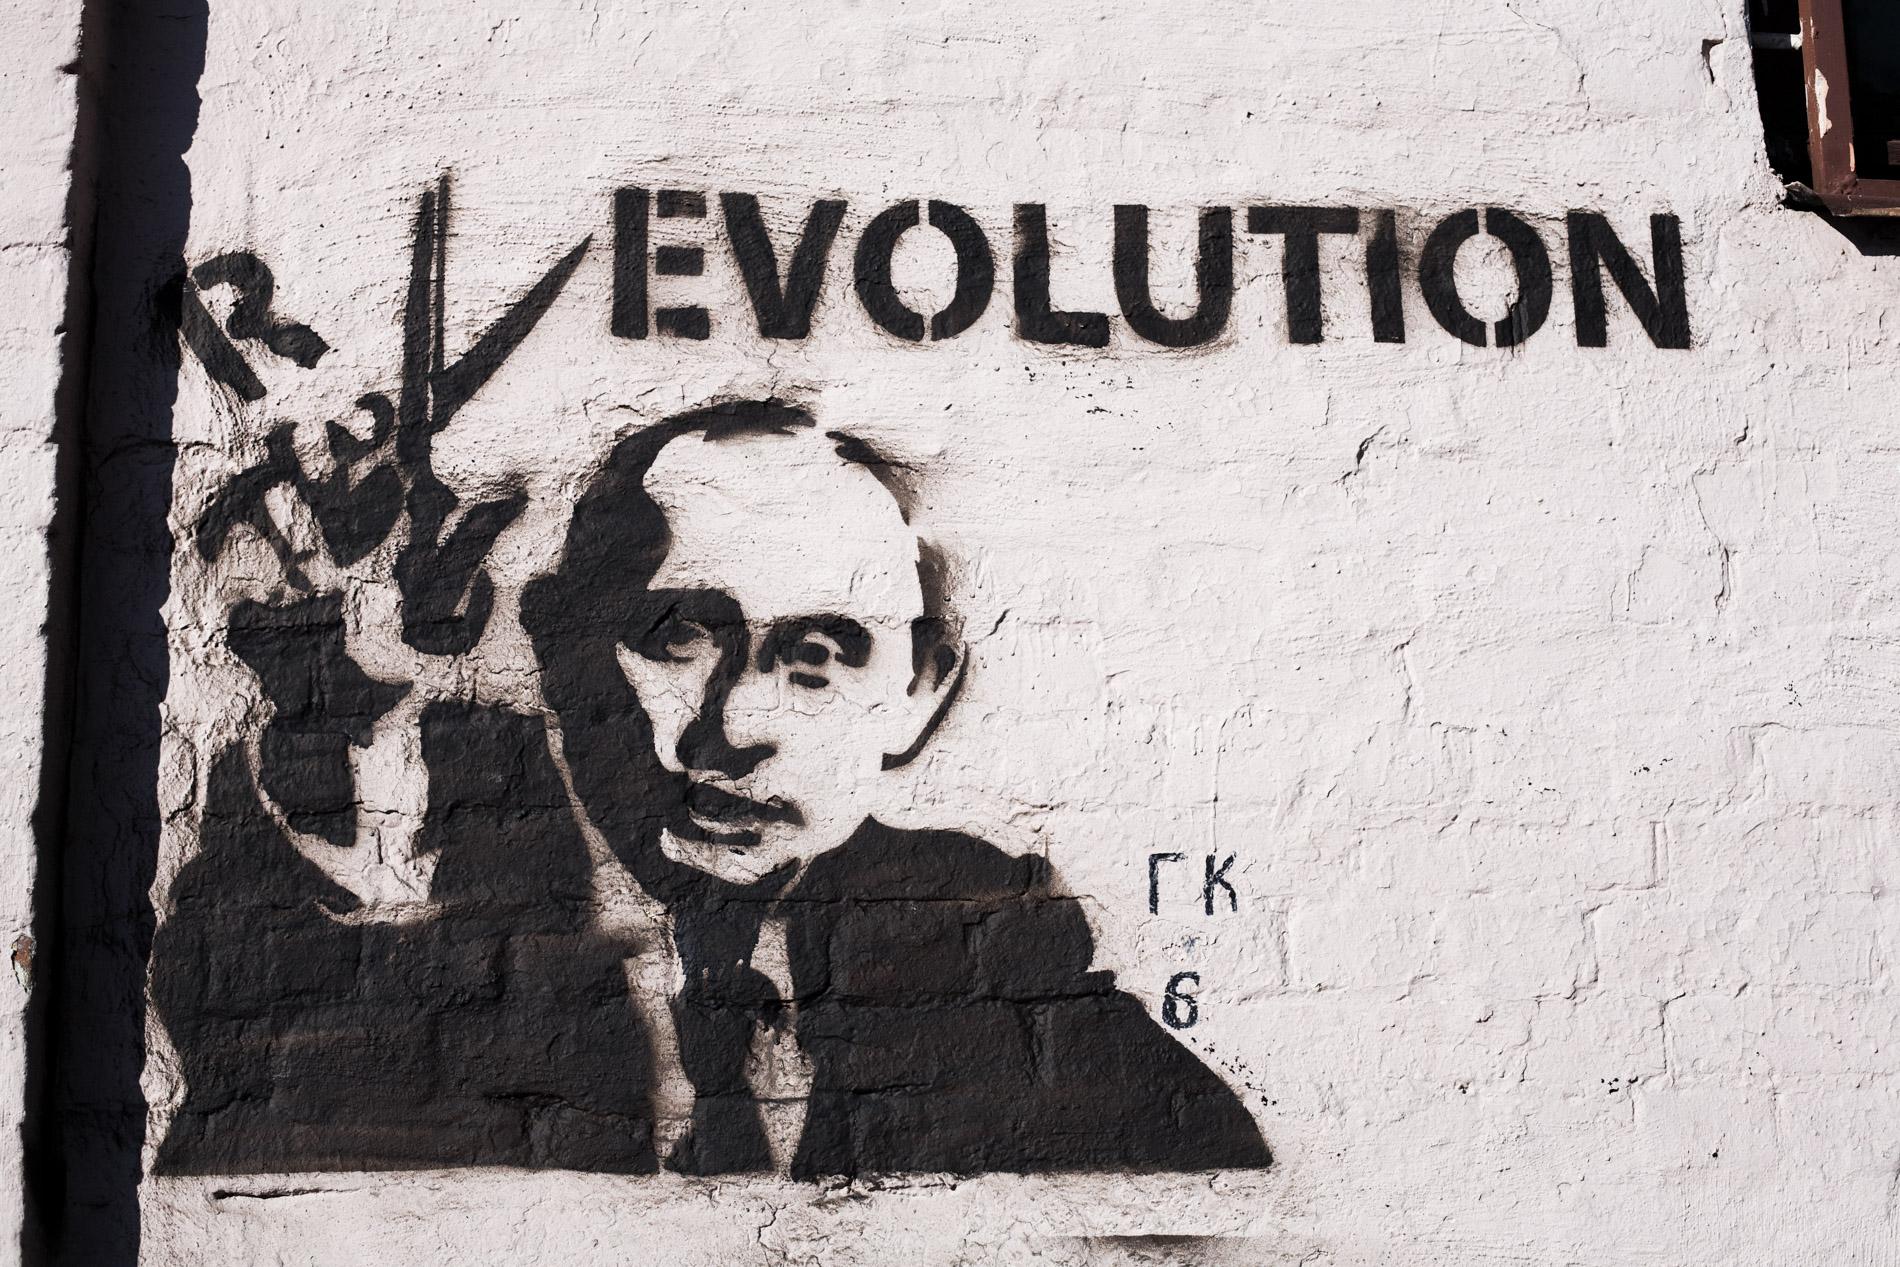 Moscou tag revolution